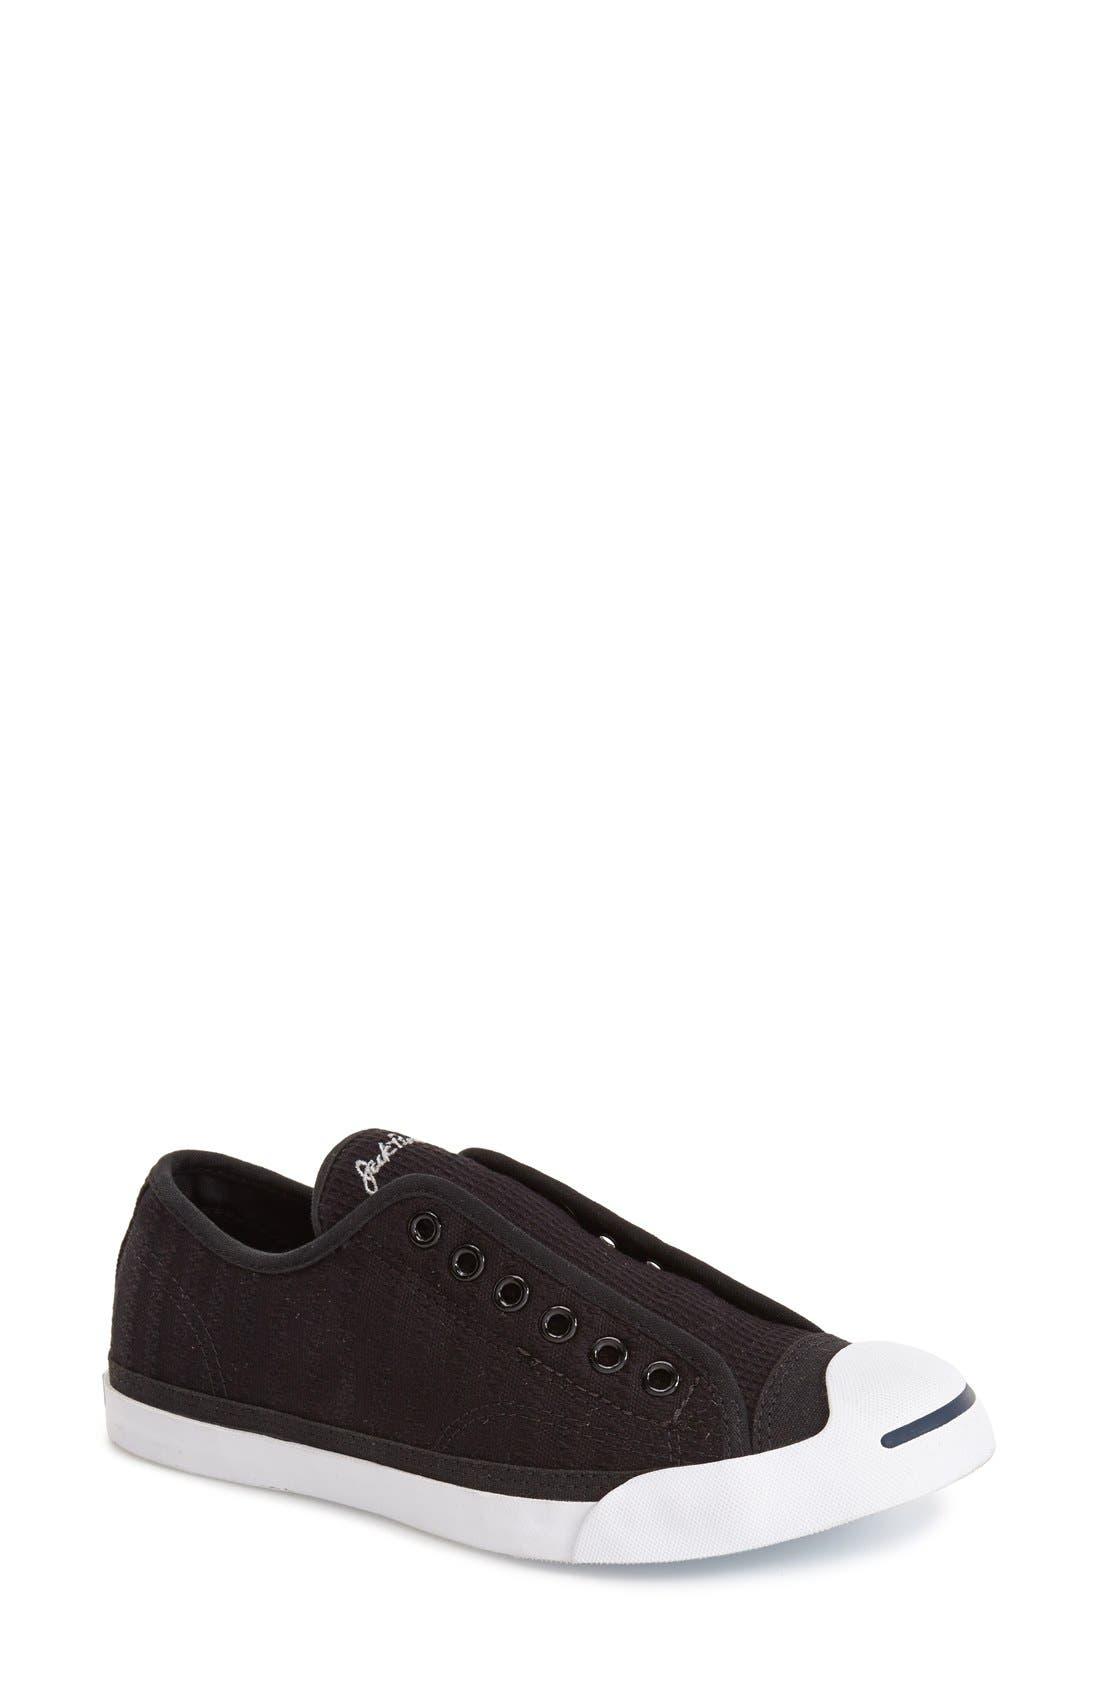 'Jack Purcell' Garment Dye Low Top Sneaker,                             Main thumbnail 1, color,